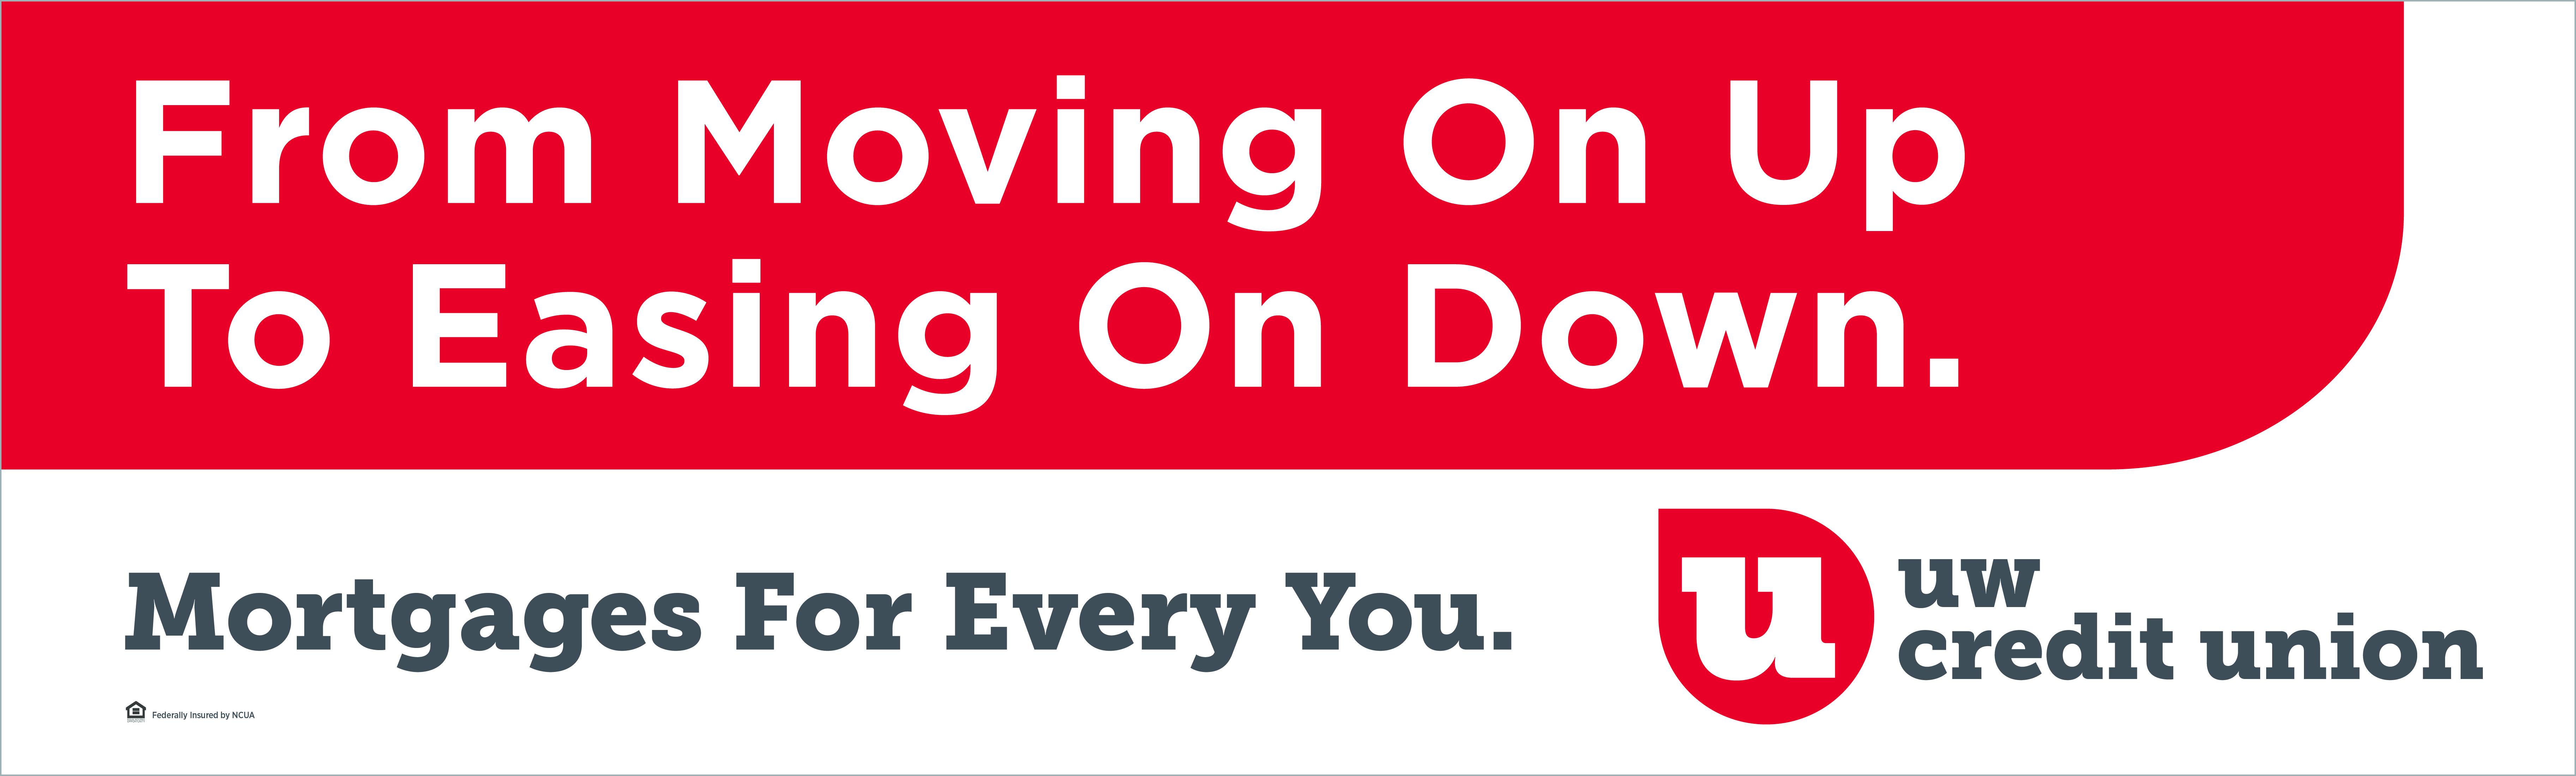 UWCU-Mortgage-Madison-Bulletin-Outdoor-OL2